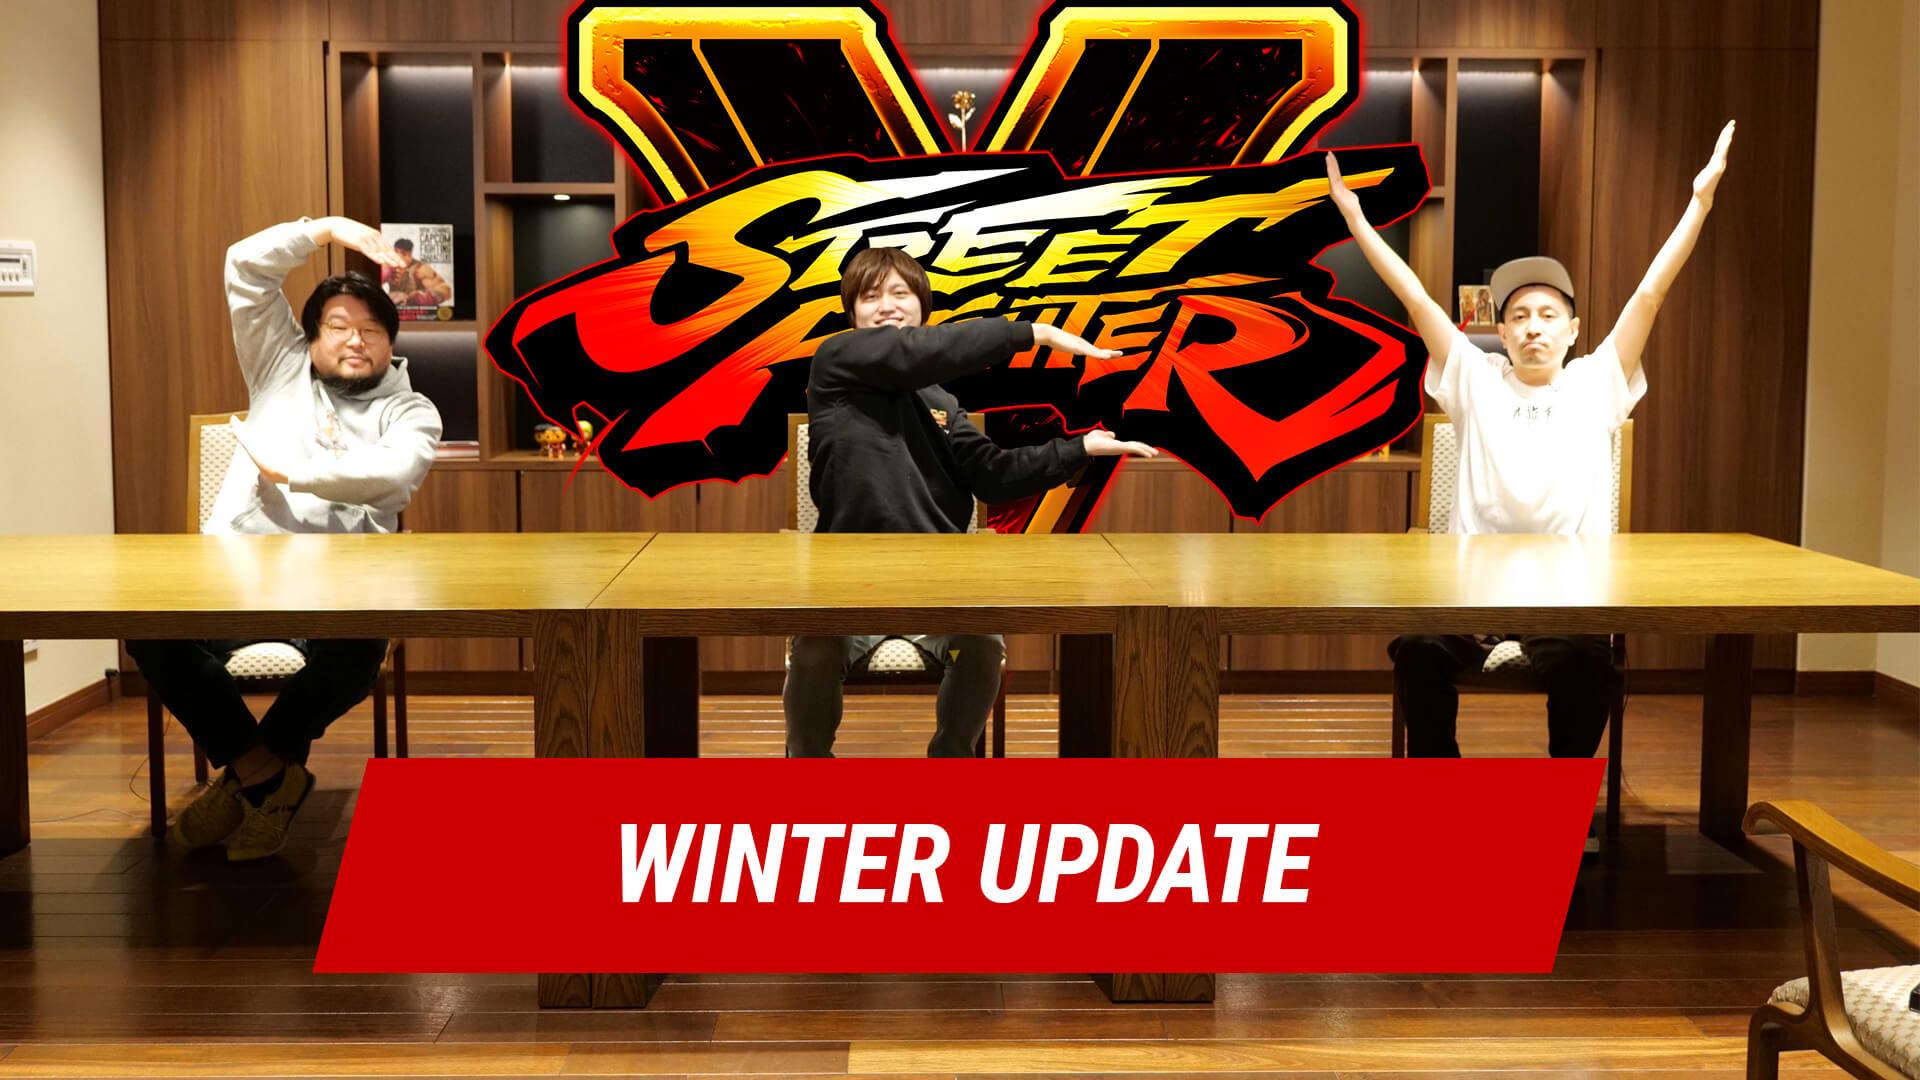 Street Fighter Winter Update